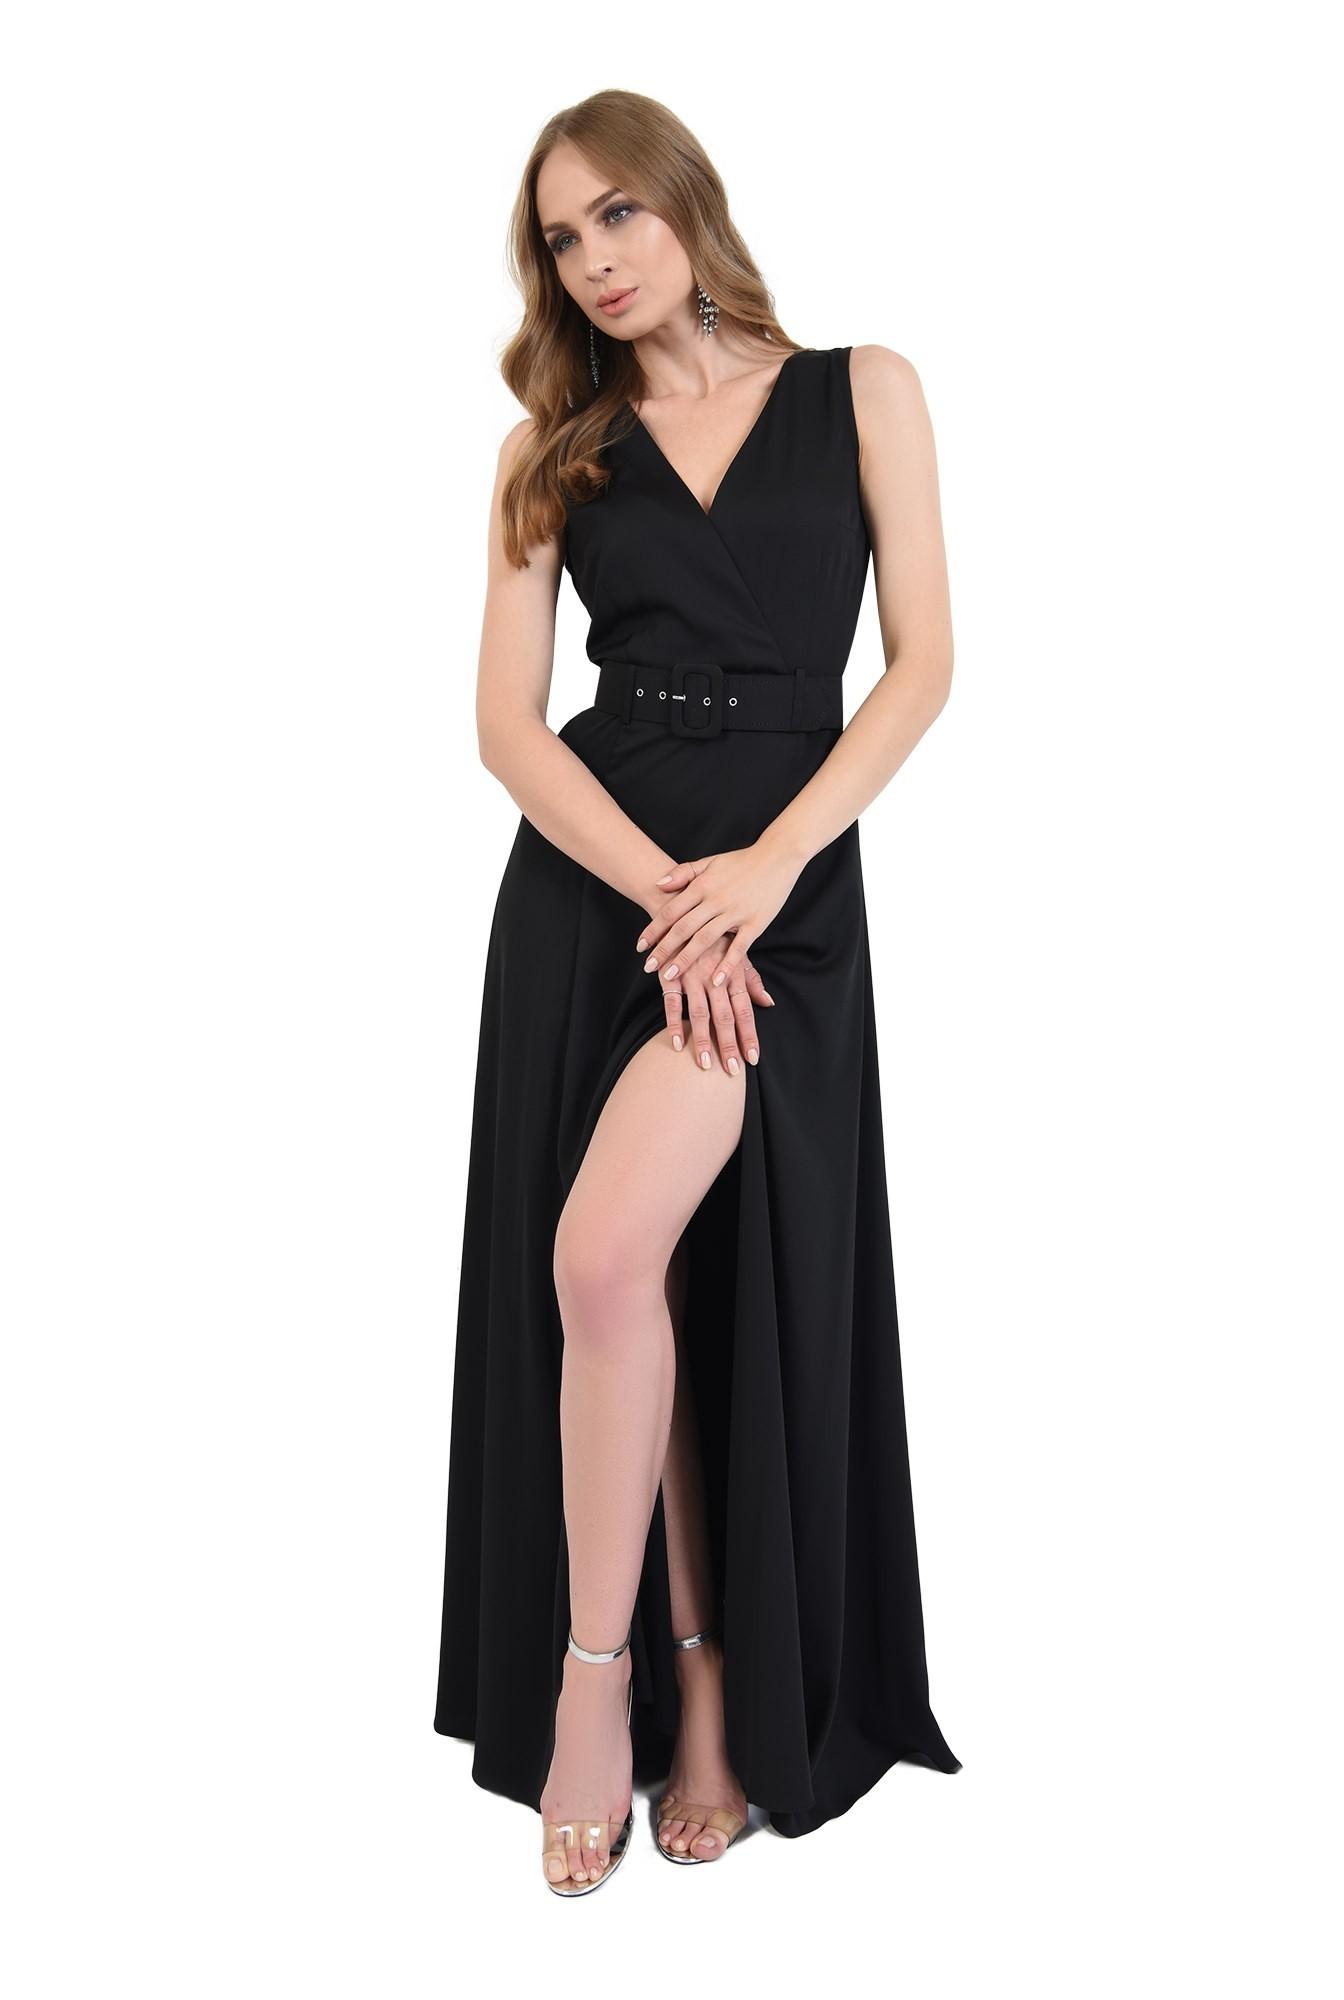 360 - rochie lunga, neagra, cu centura, Poema